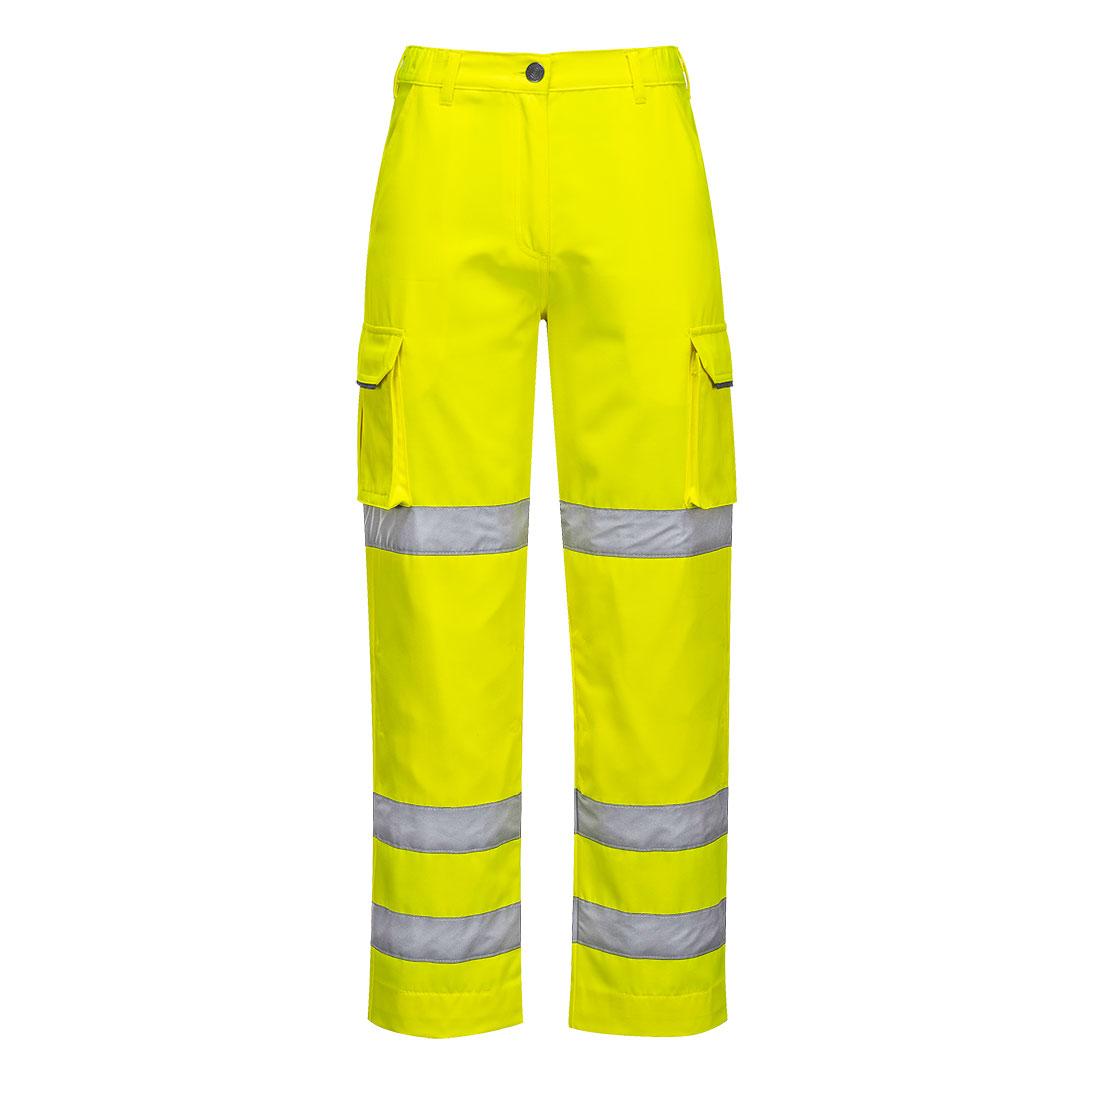 Ladies Hi-Vis Trousers Yellow XXLR